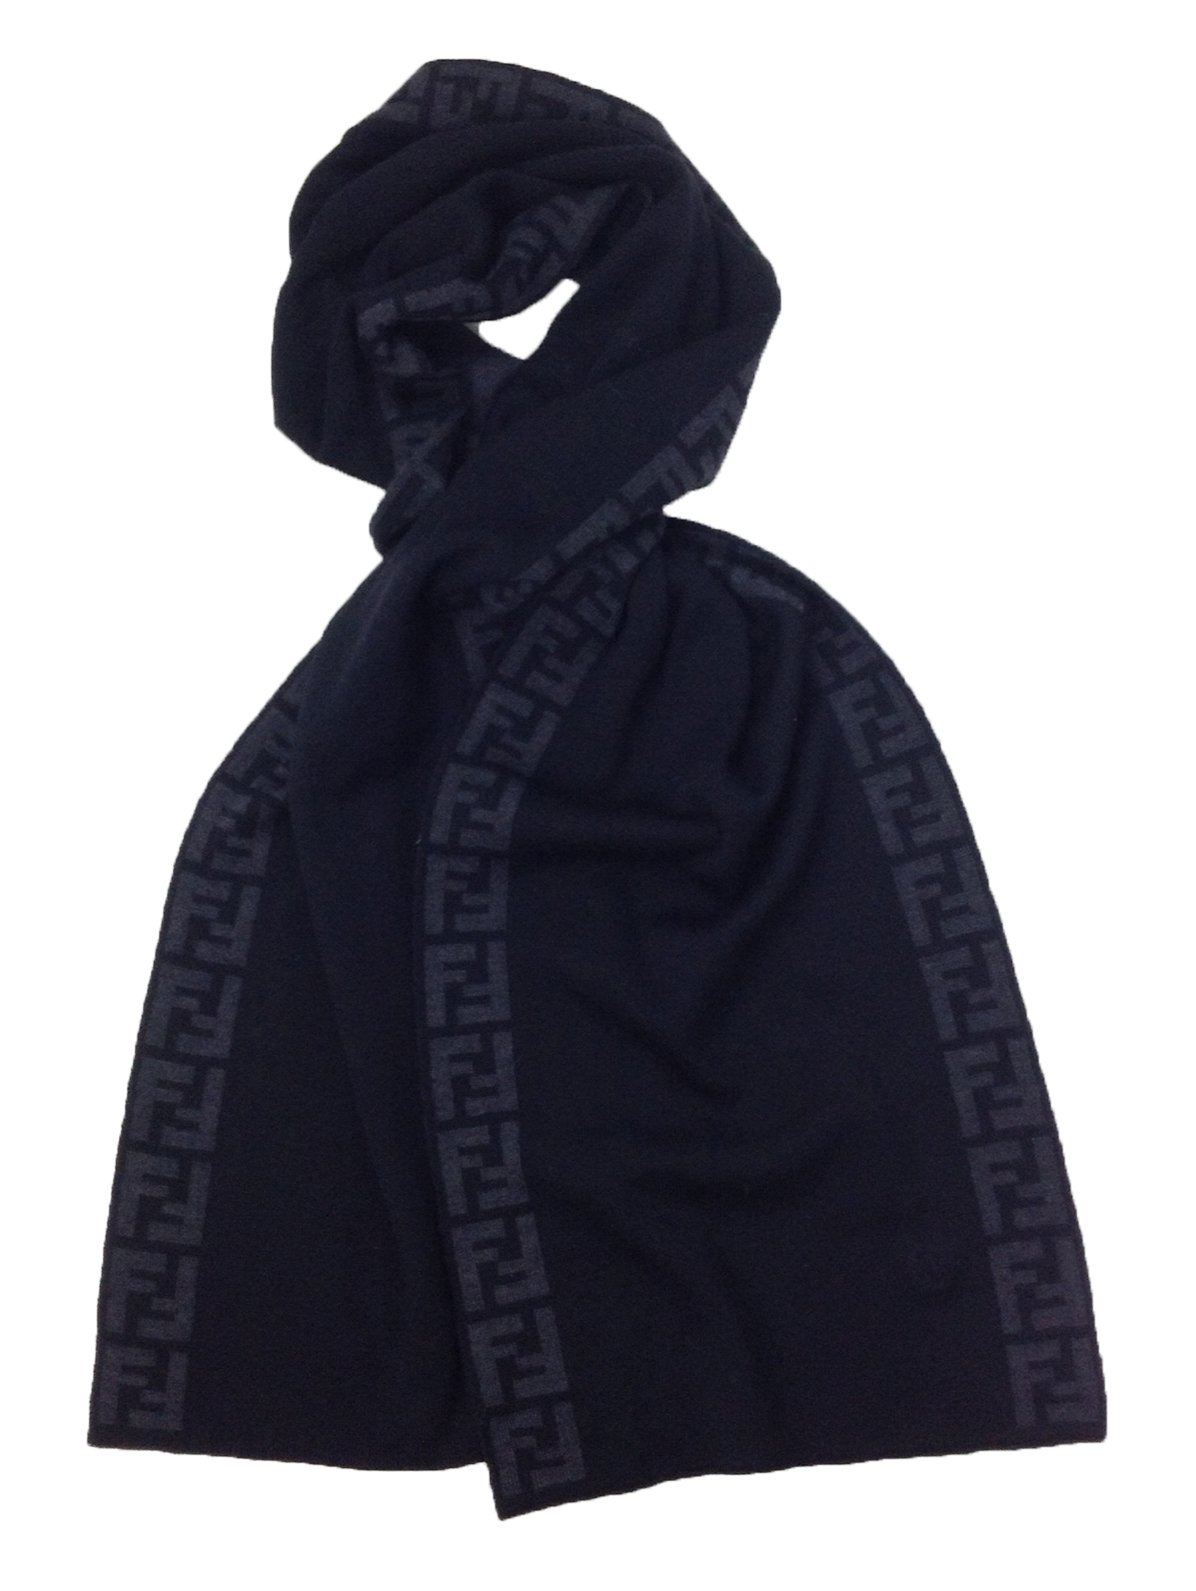 Fendi Knit Monogram Wool Scarf Zucca Stripe, Nero Black